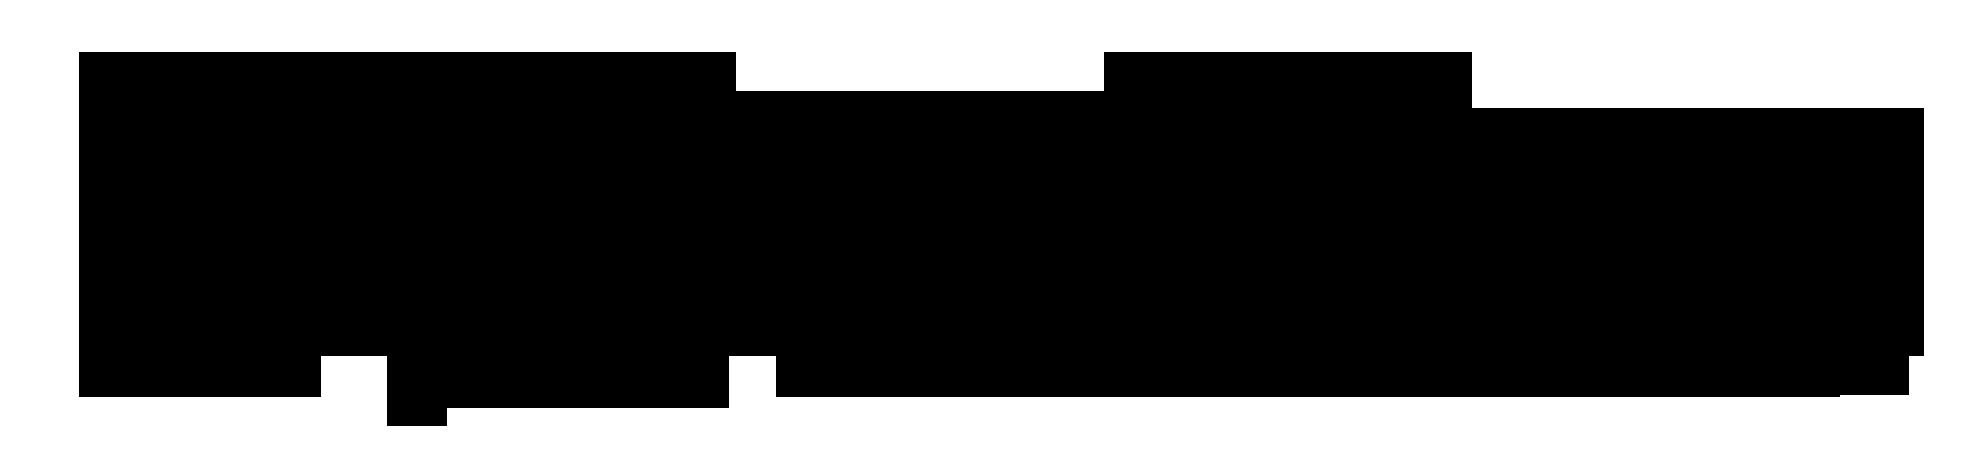 Sala100virtual